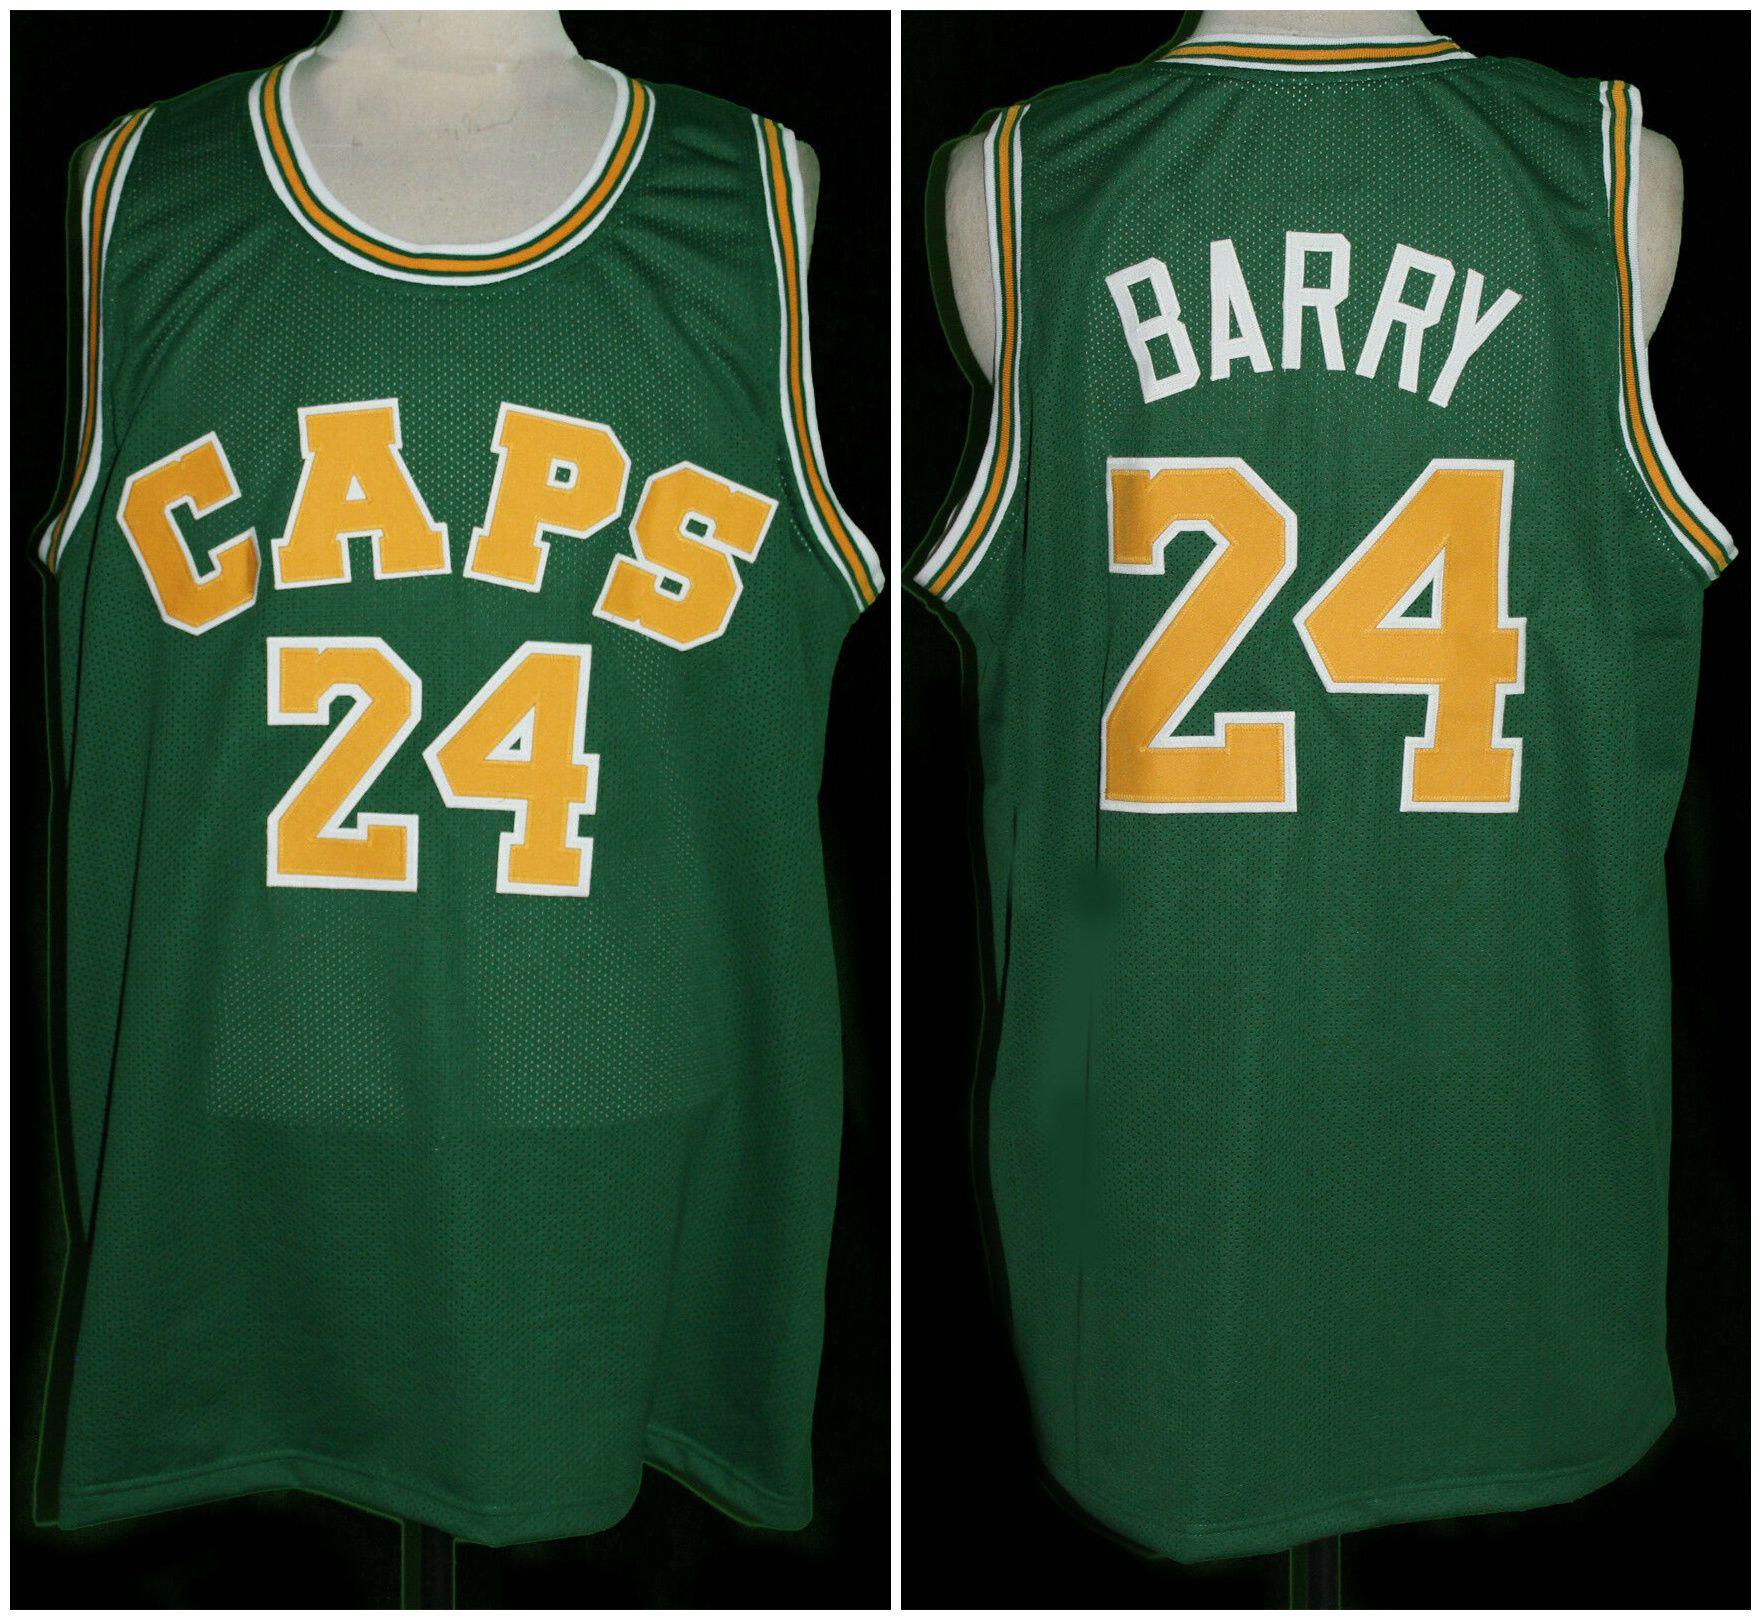 d995d00e6 Compre Rick Barry   24 Washington Caps Retro Basketball Jersey Para Hombre  Cosido Número Personalizado Jerseys Nombre A  23.35 Del Yufan5